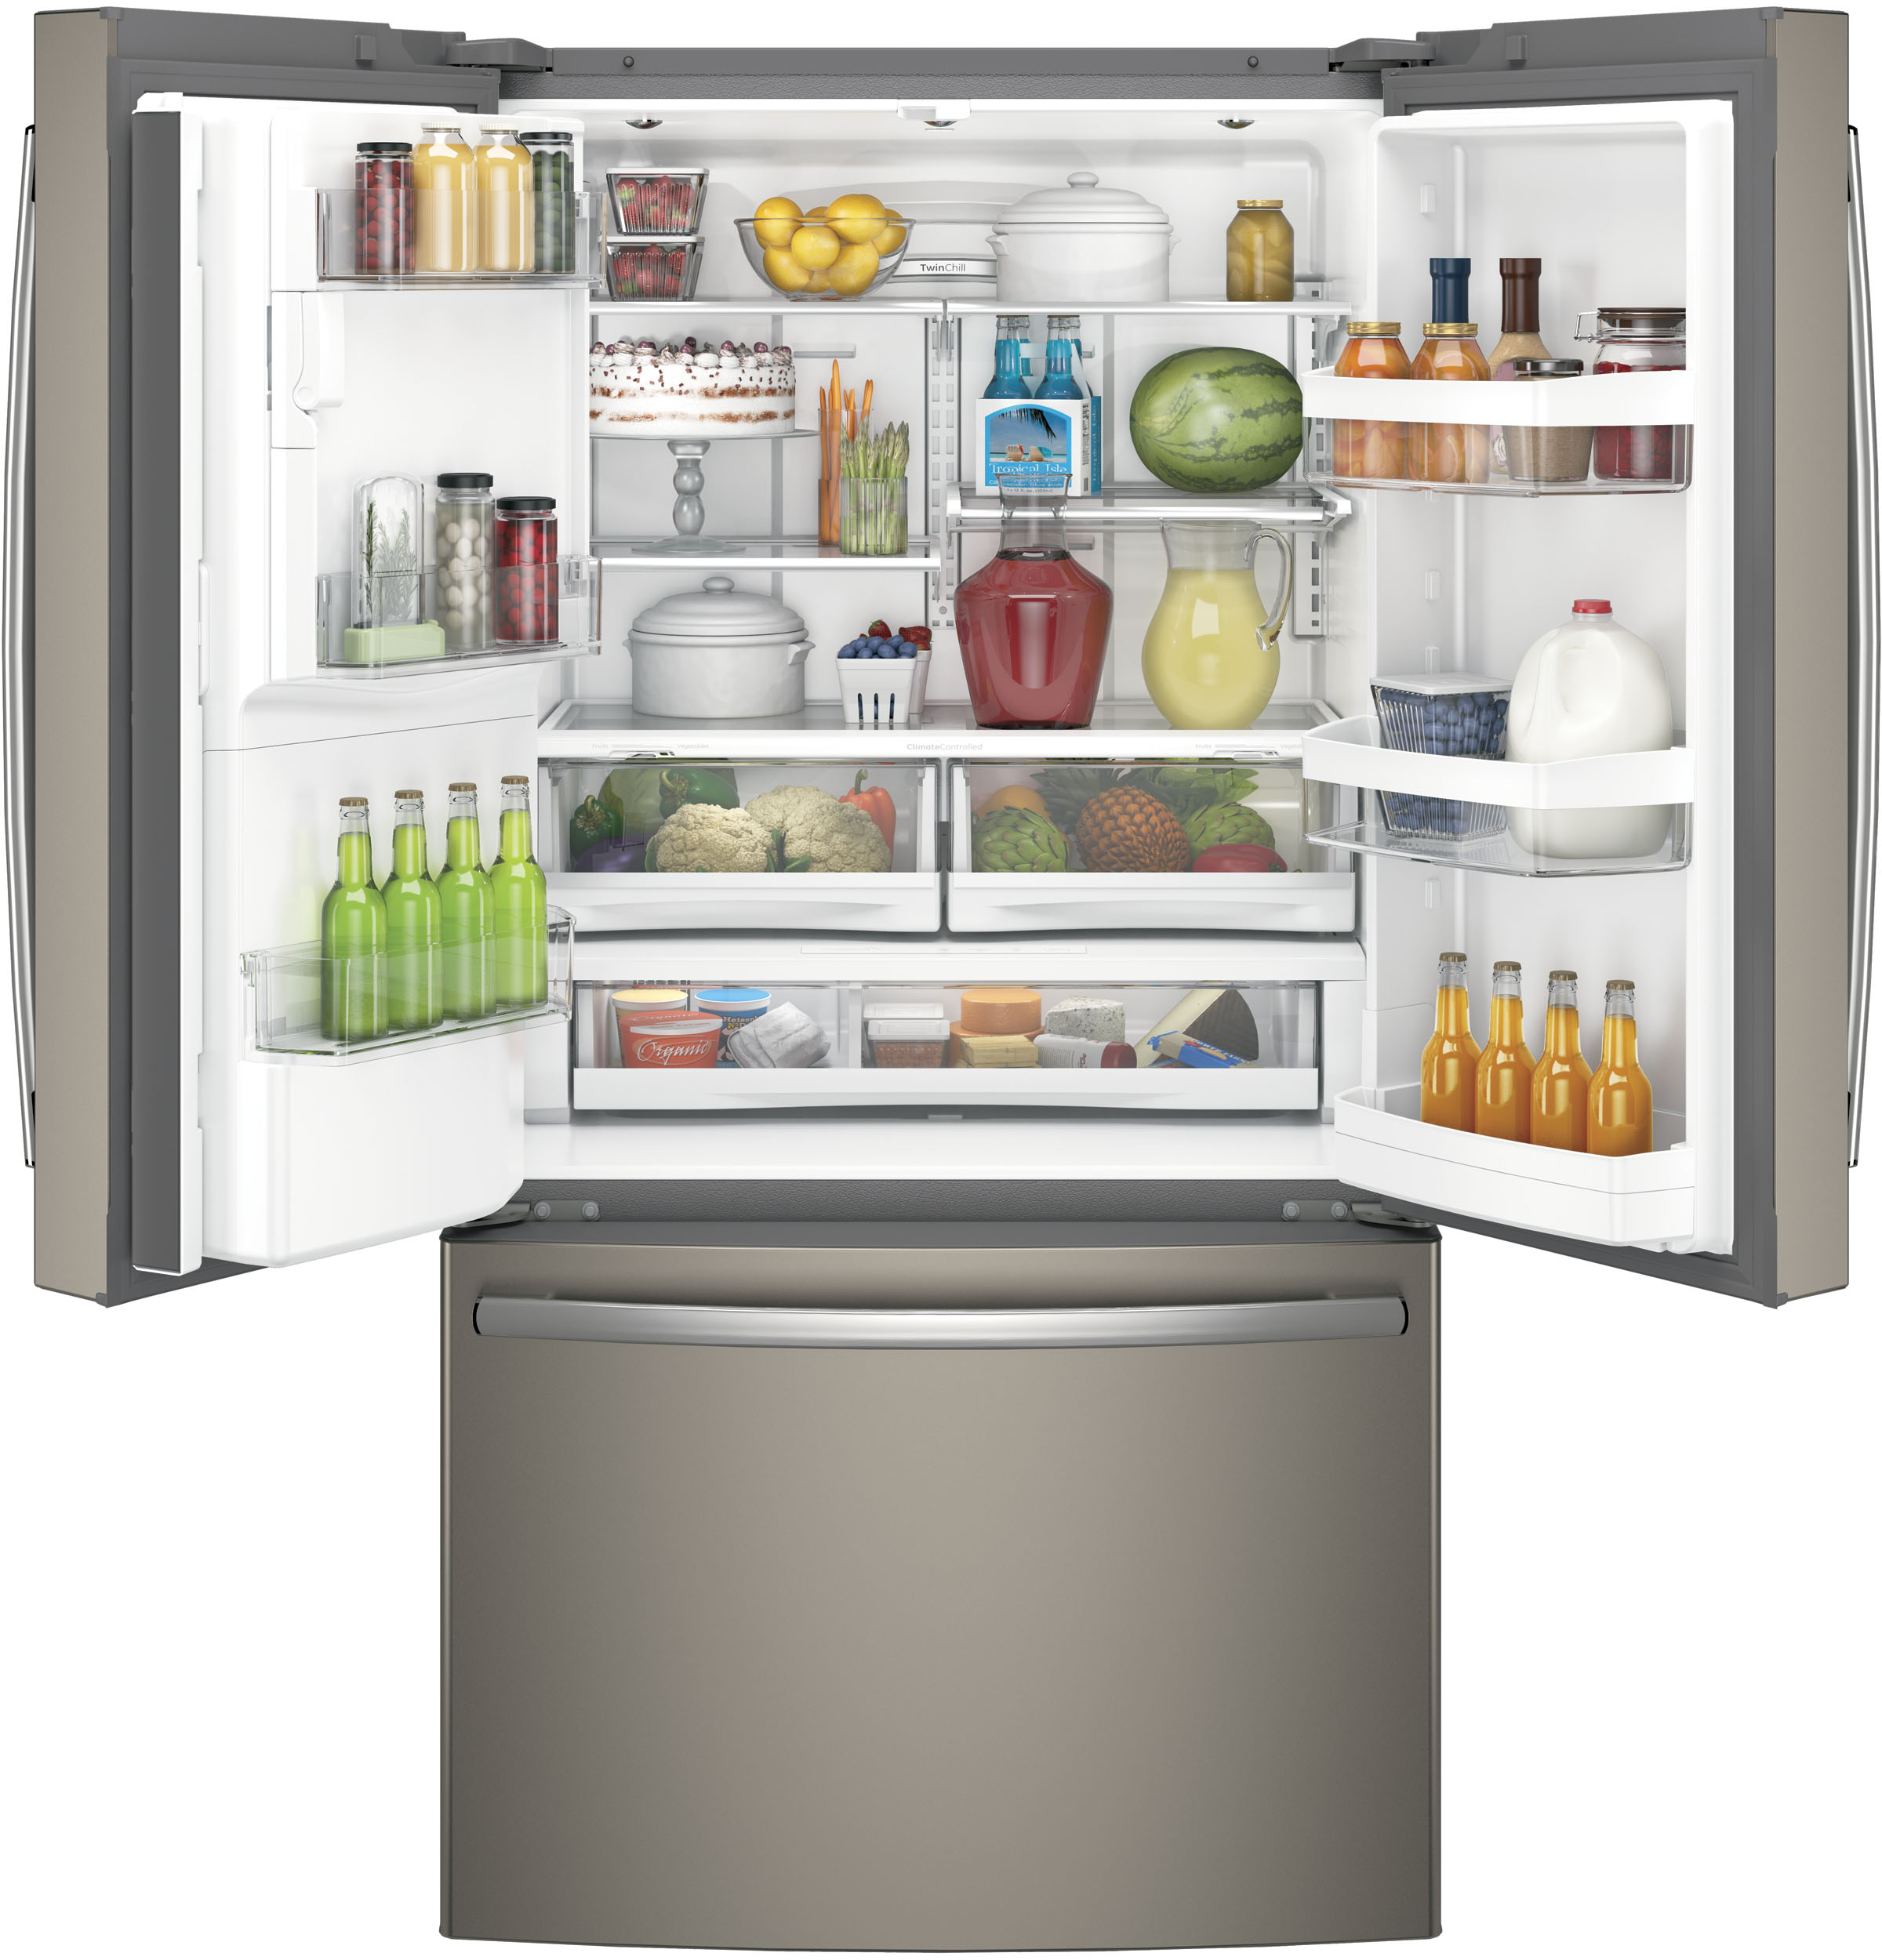 GE Appliances GYE22HMKES 22.2 cu. ft. Counter Depth French Door Refrigerator - Slate